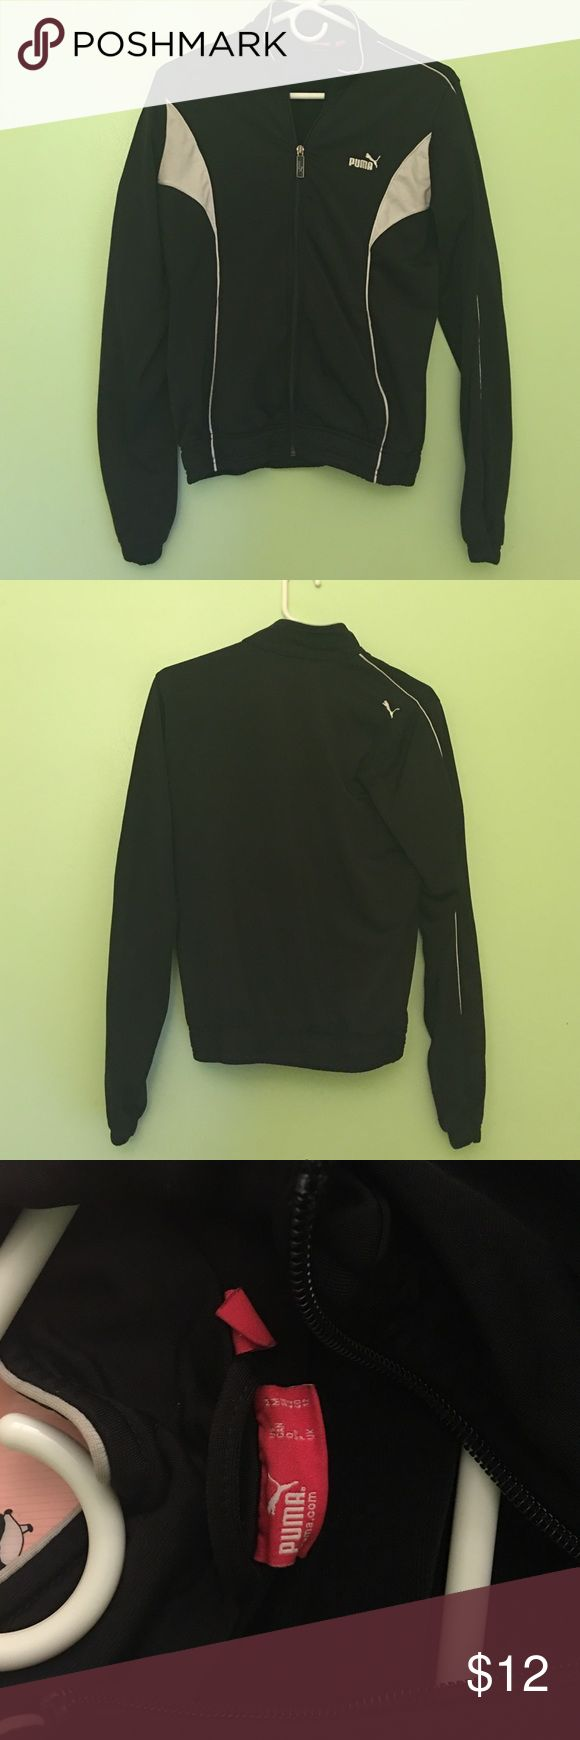 Puma Sports Jacket Black and white Puma Sports jacket. Worn a few times! Size M but can fit a small Puma Jackets & Coats